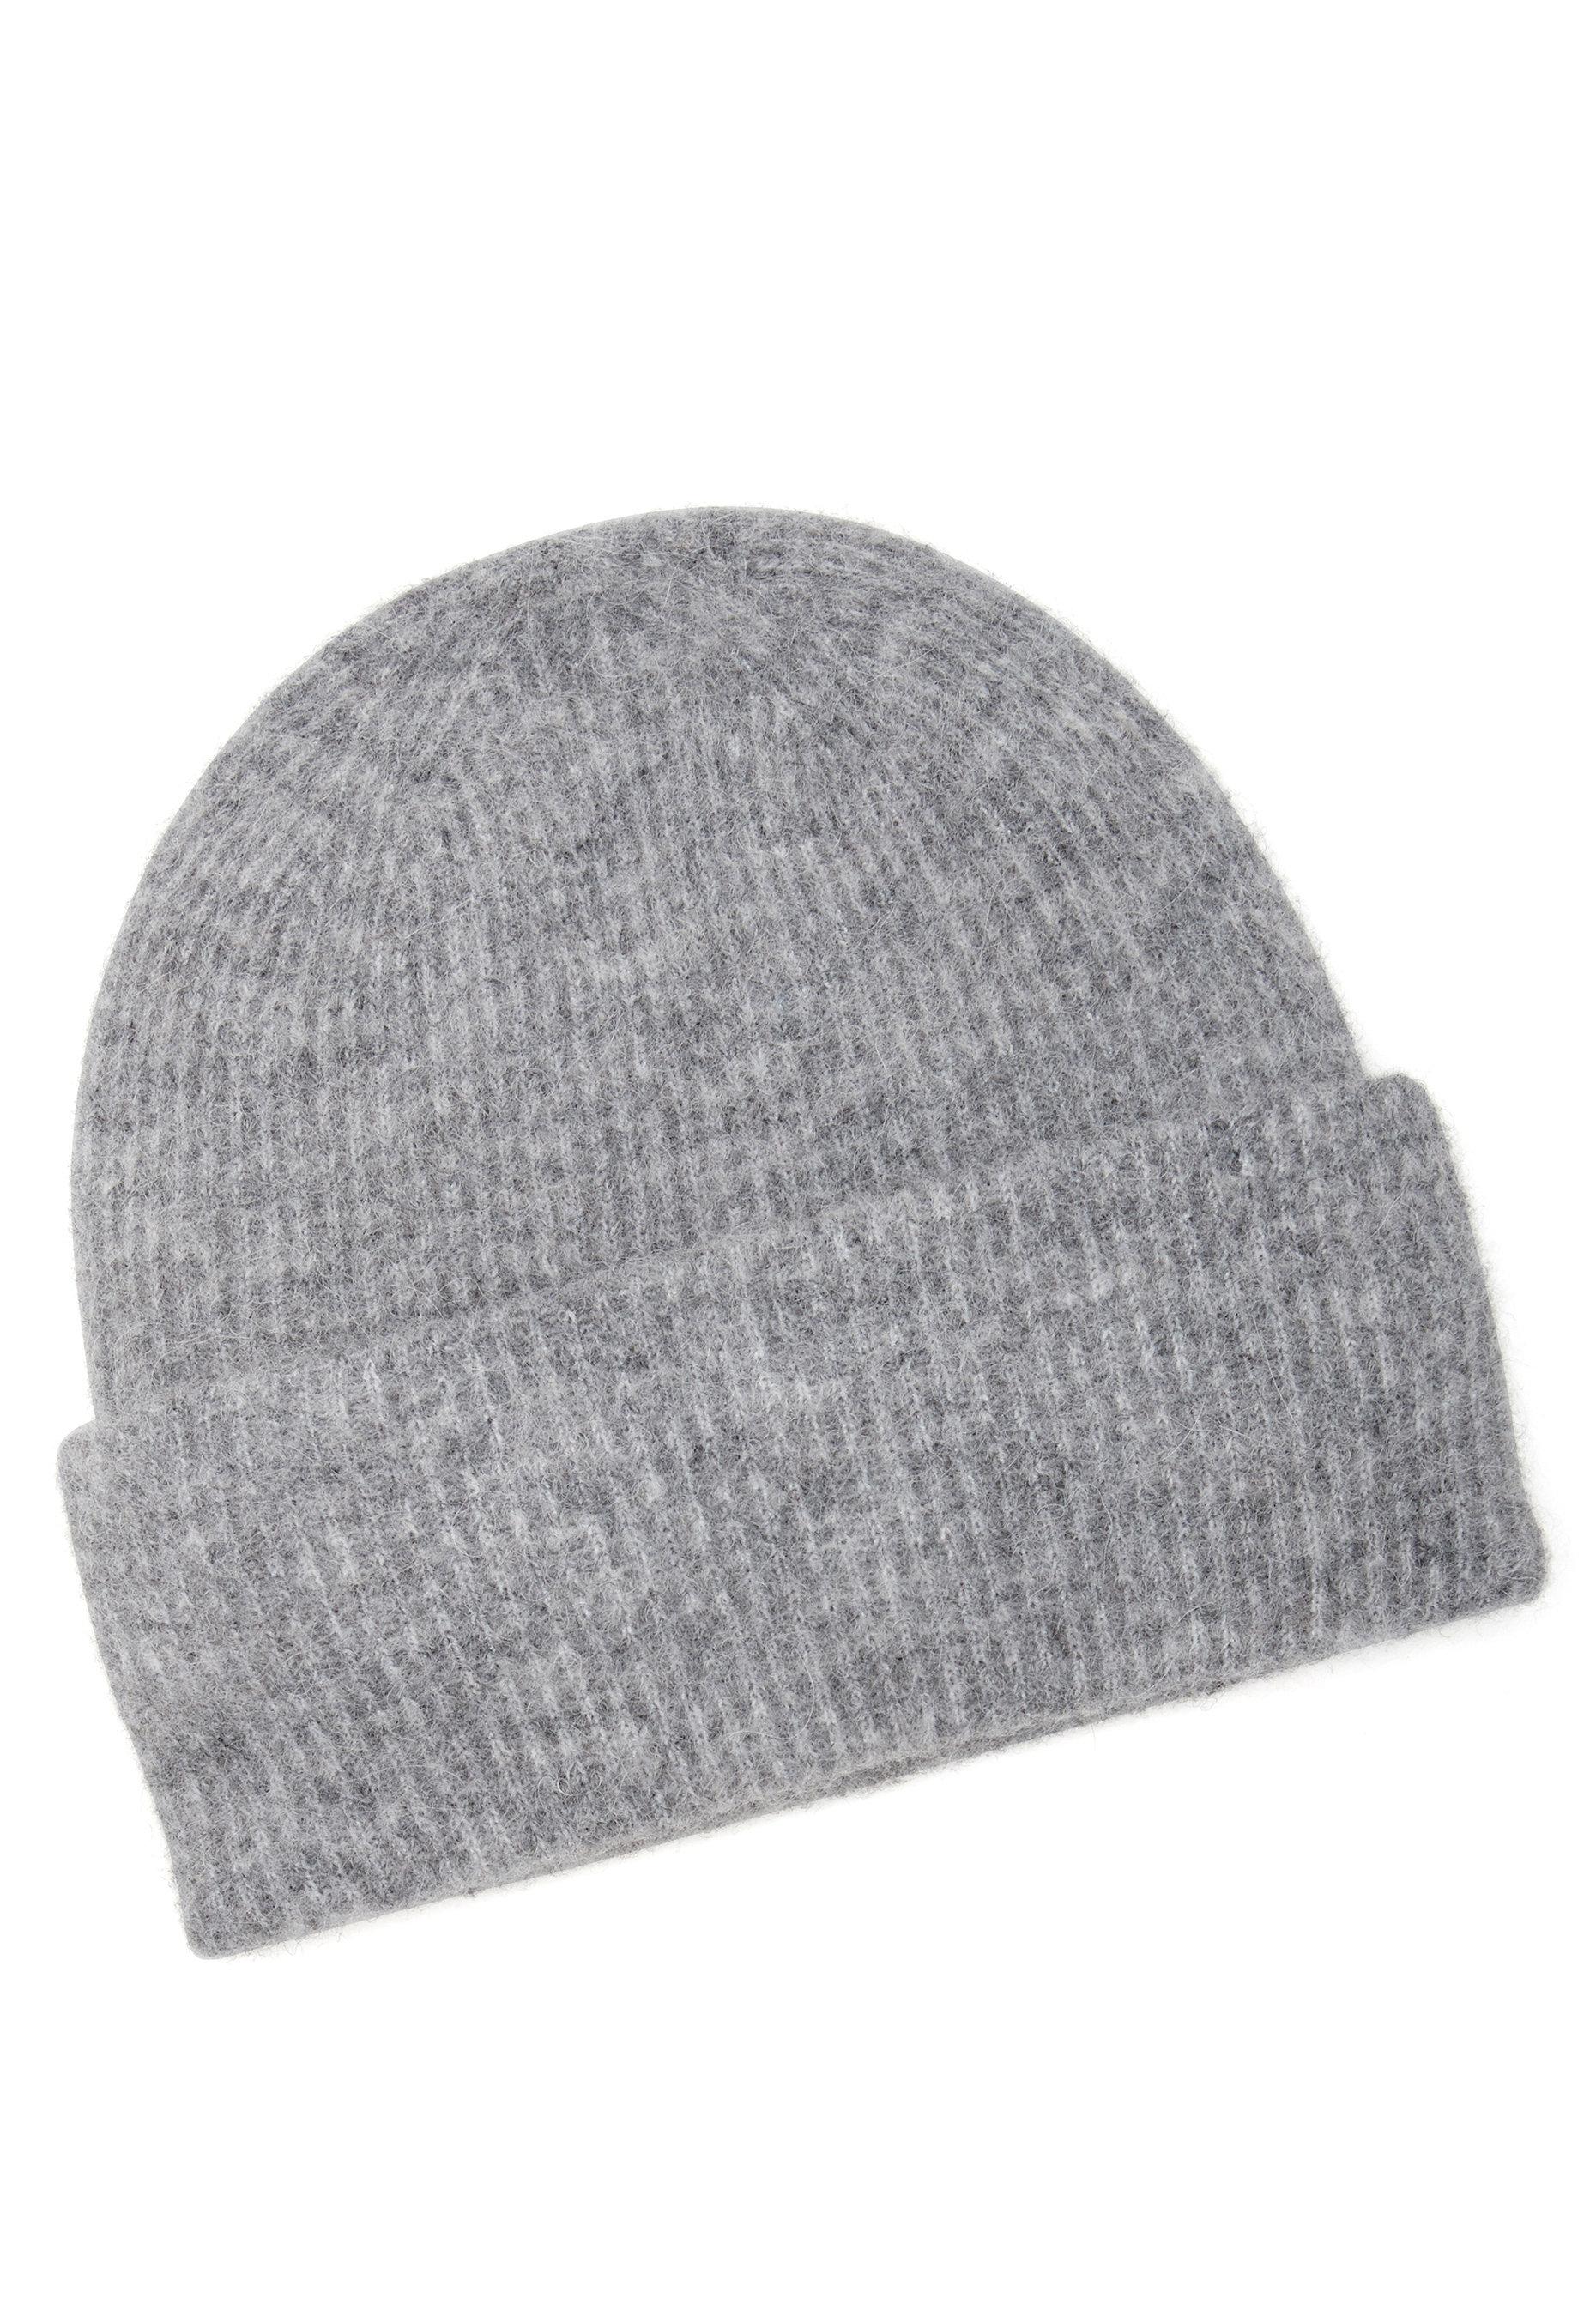 16ce5df2 Samsøe & Samsøe Nor Hat Grey Melange - Bubbleroom